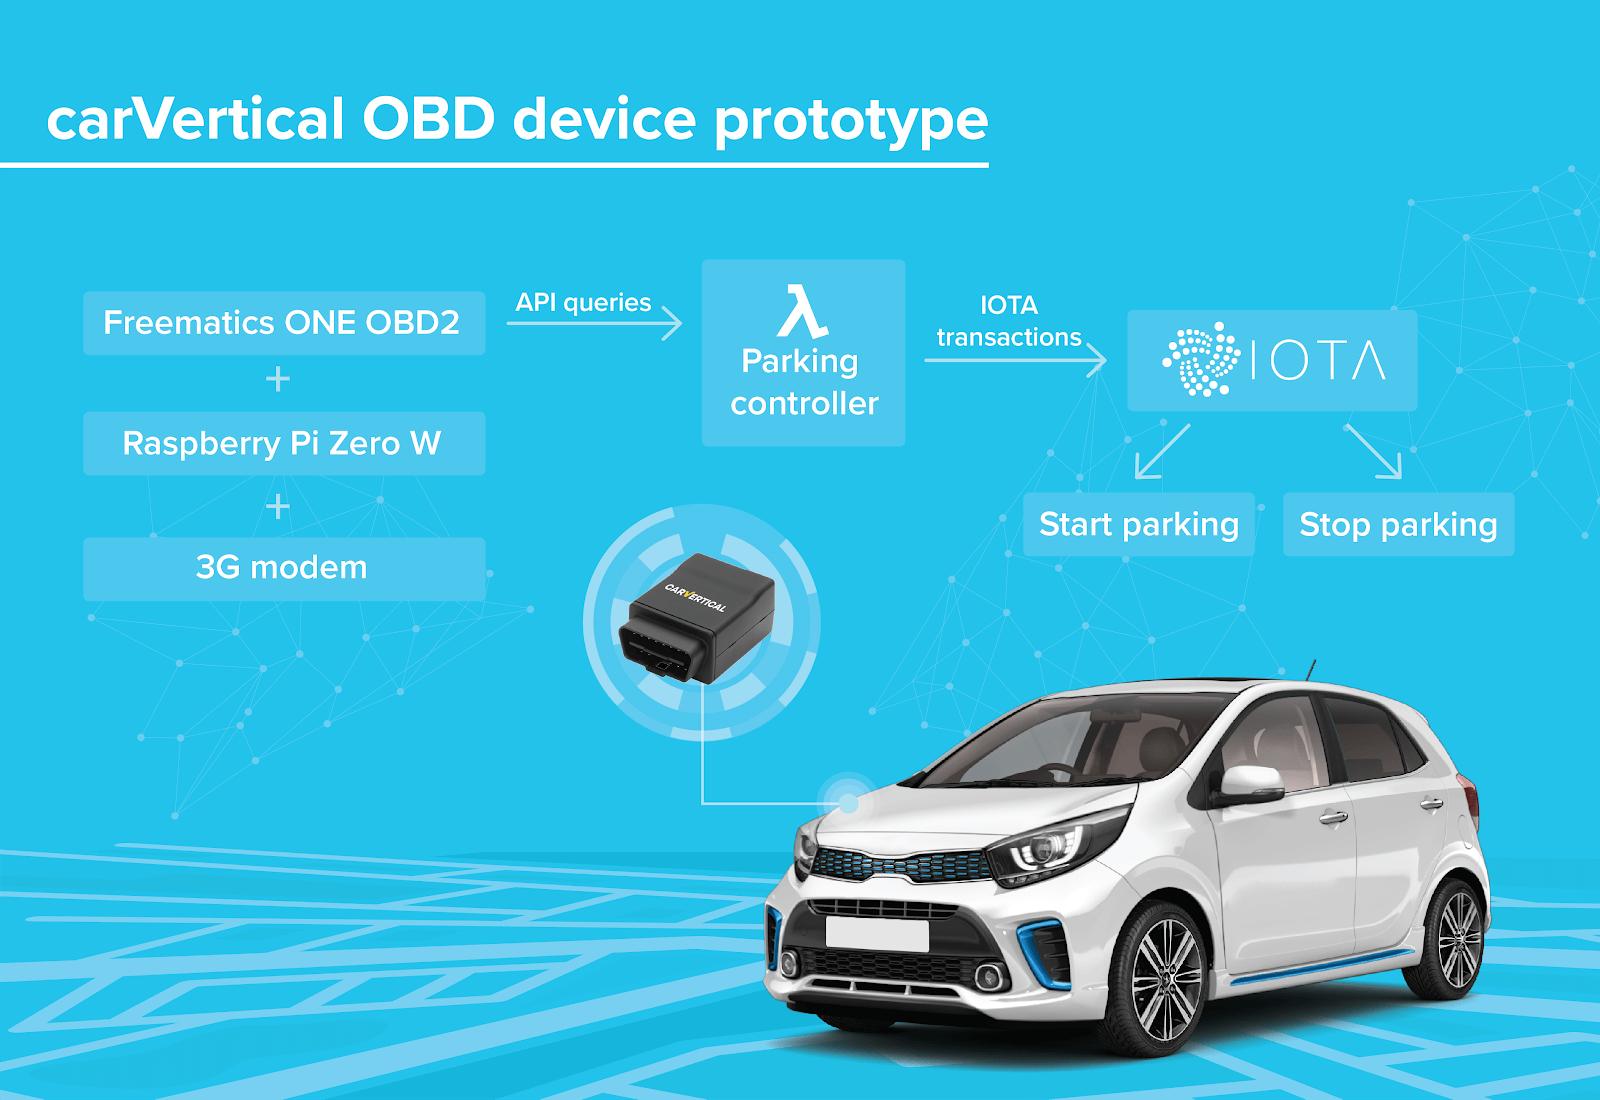 Autonomous future: carVertical is bringing IoT benefits to everyday